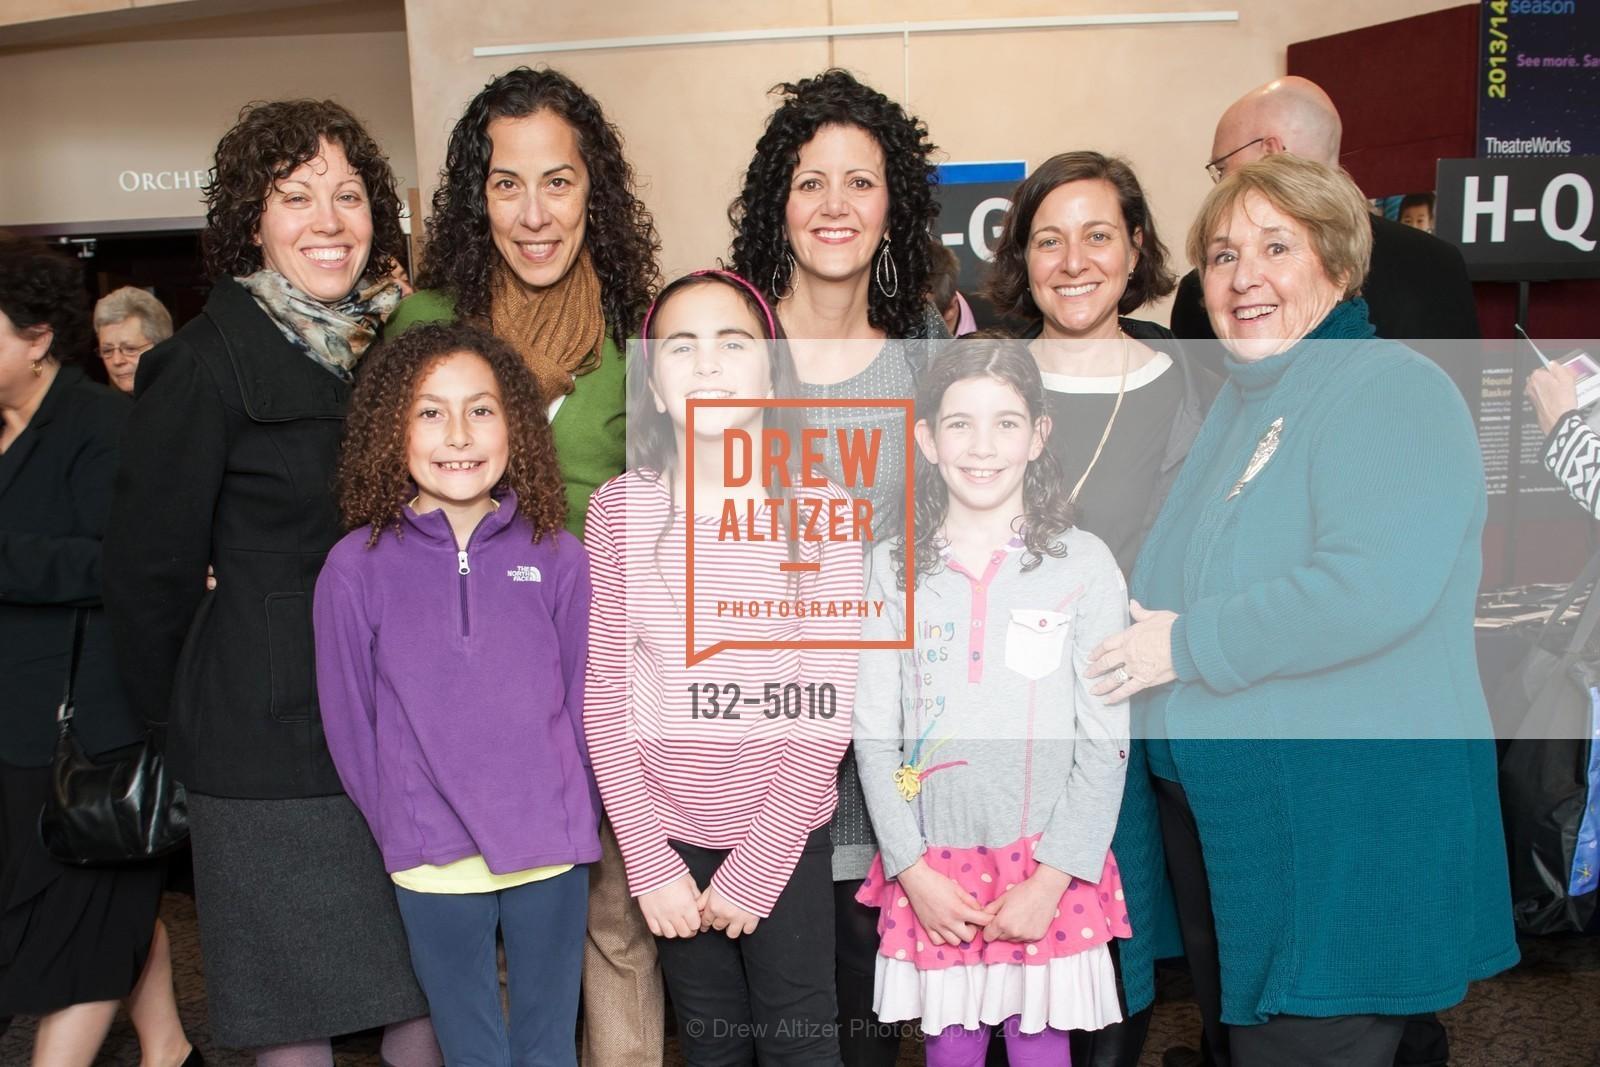 Tzitor Ulman, Madeleine Hale, Rachel Berman, Lauren Berman, Riki Alcheck, Randi Britt, Photo #132-5010